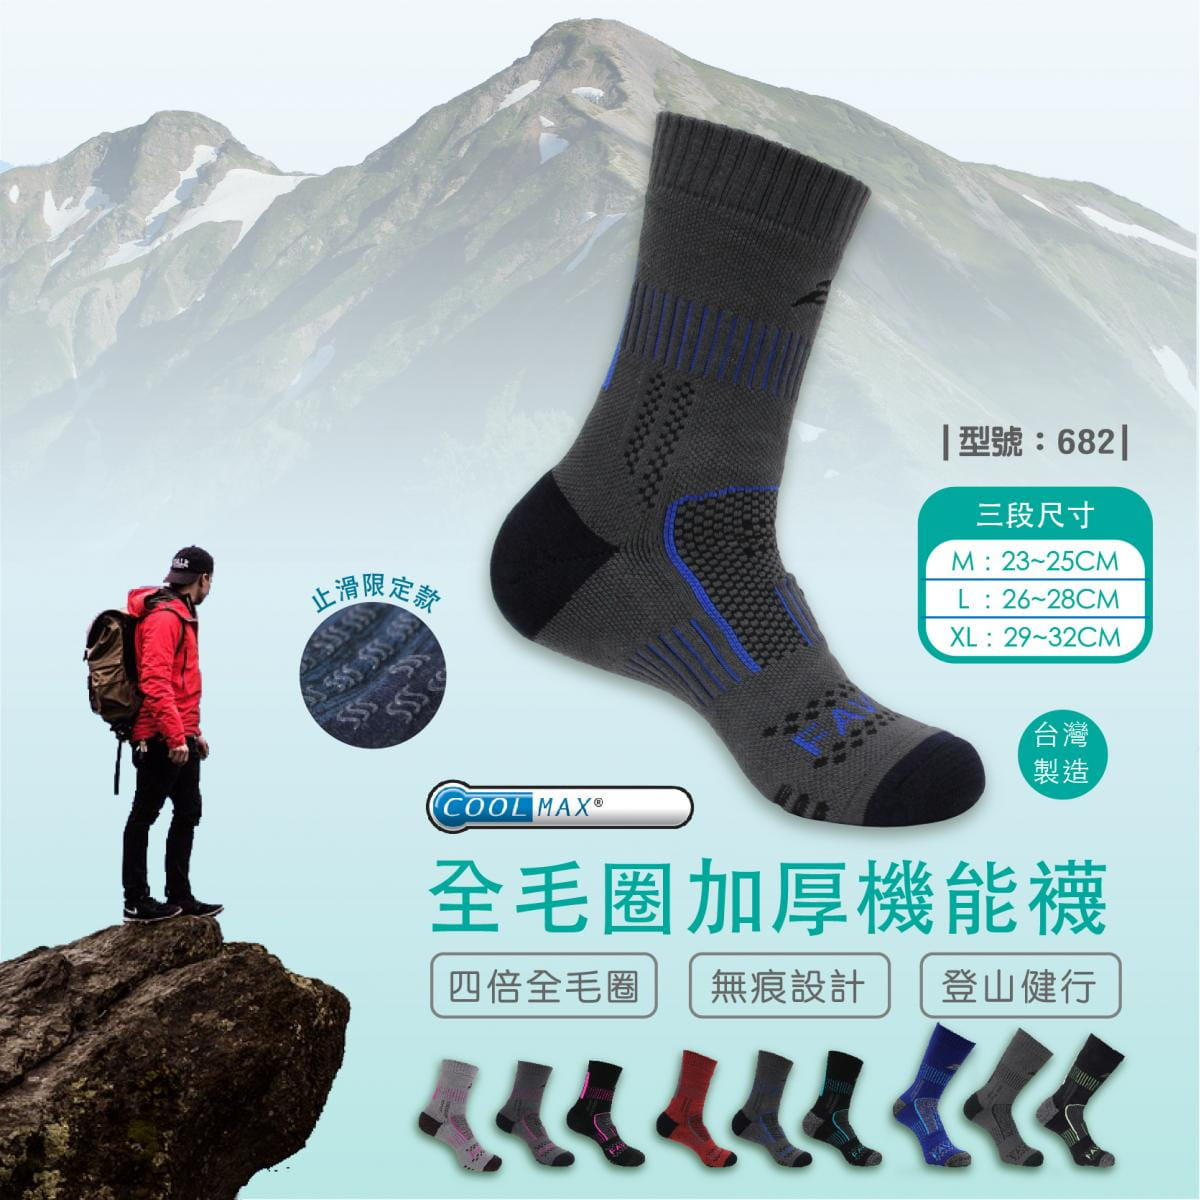 【FAV】止滑加厚保暖登山襪 0